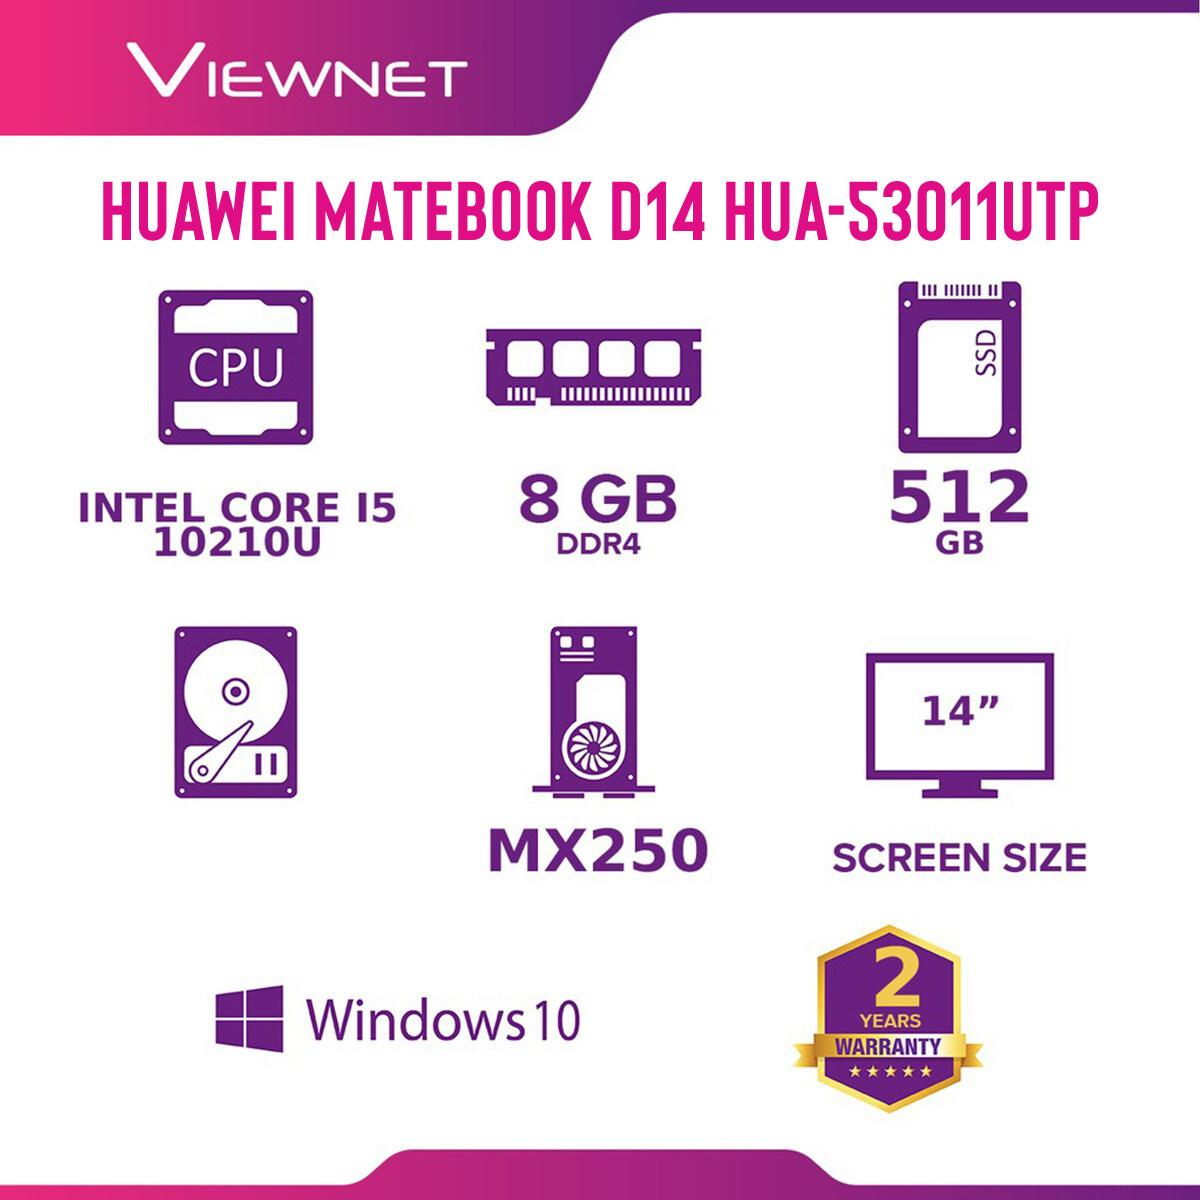 HUAWEI MATEBOOK D14 / HUAWEI MATEBOOK D15 Intel Core i5 LAPTOP / HUA-53011UTP / HUA-53012BYF / HUA-53012CAR / HUA-53012BYM